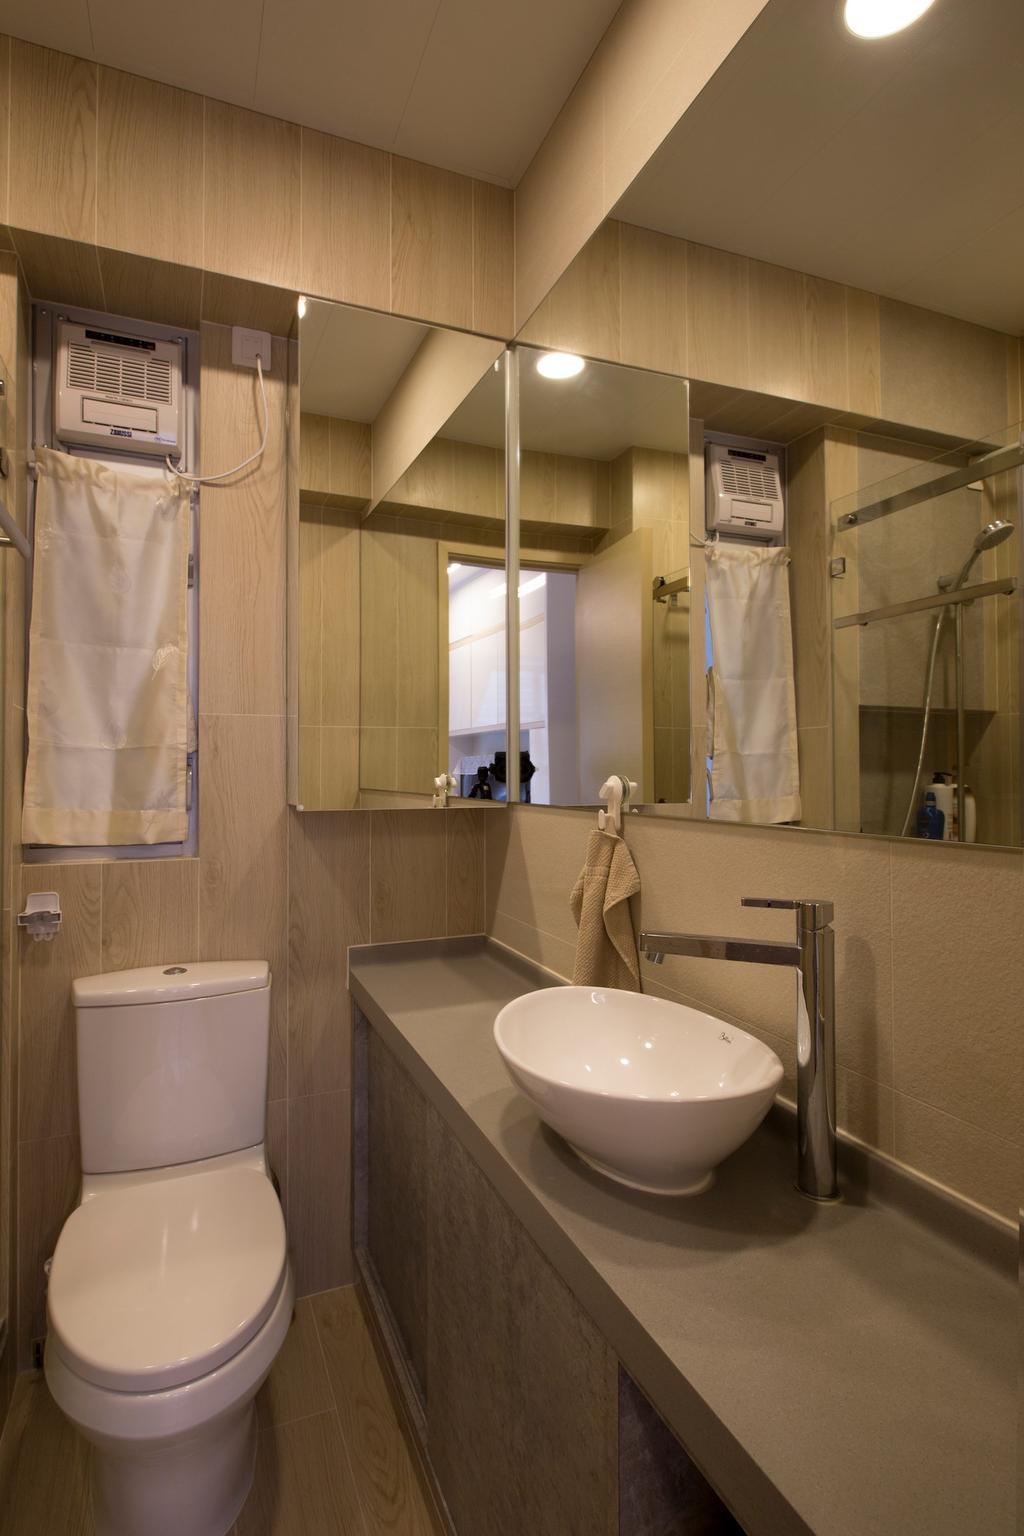 傳統, 私家樓, 浴室, 康濤閣, 室內設計師, am PLUS, Sink, Indoors, Interior Design, Room